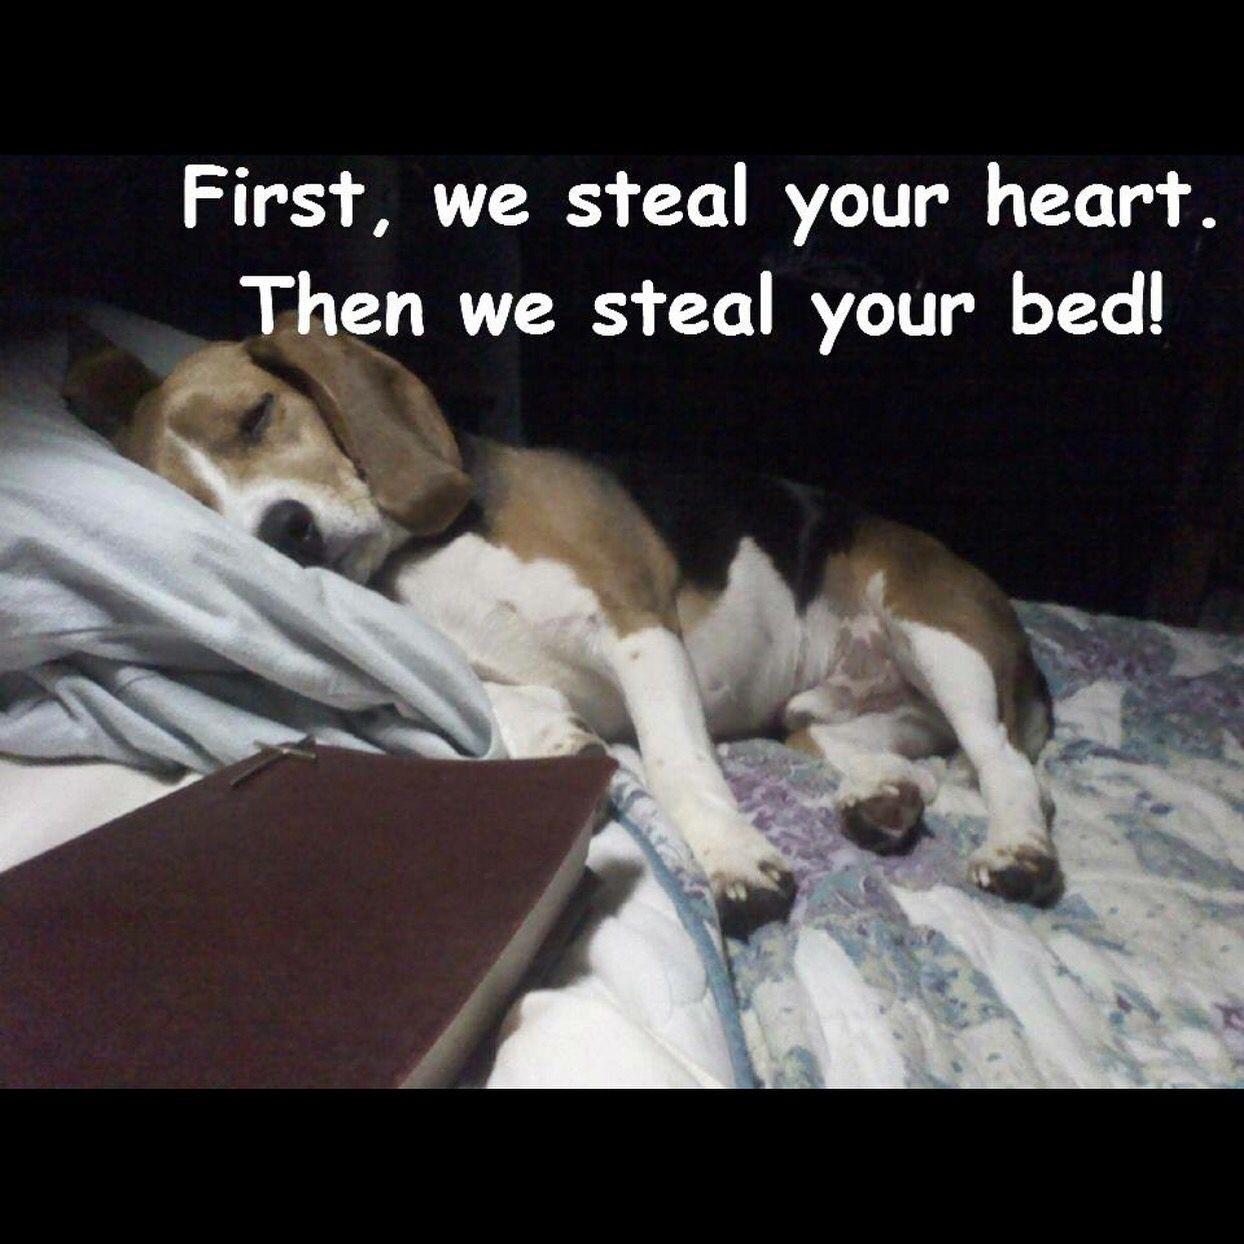 Most Inspiring Video Beagle Adorable Dog - fe7d85f6e479143ee2e48c2b614640b5  Picture_343818  .jpg